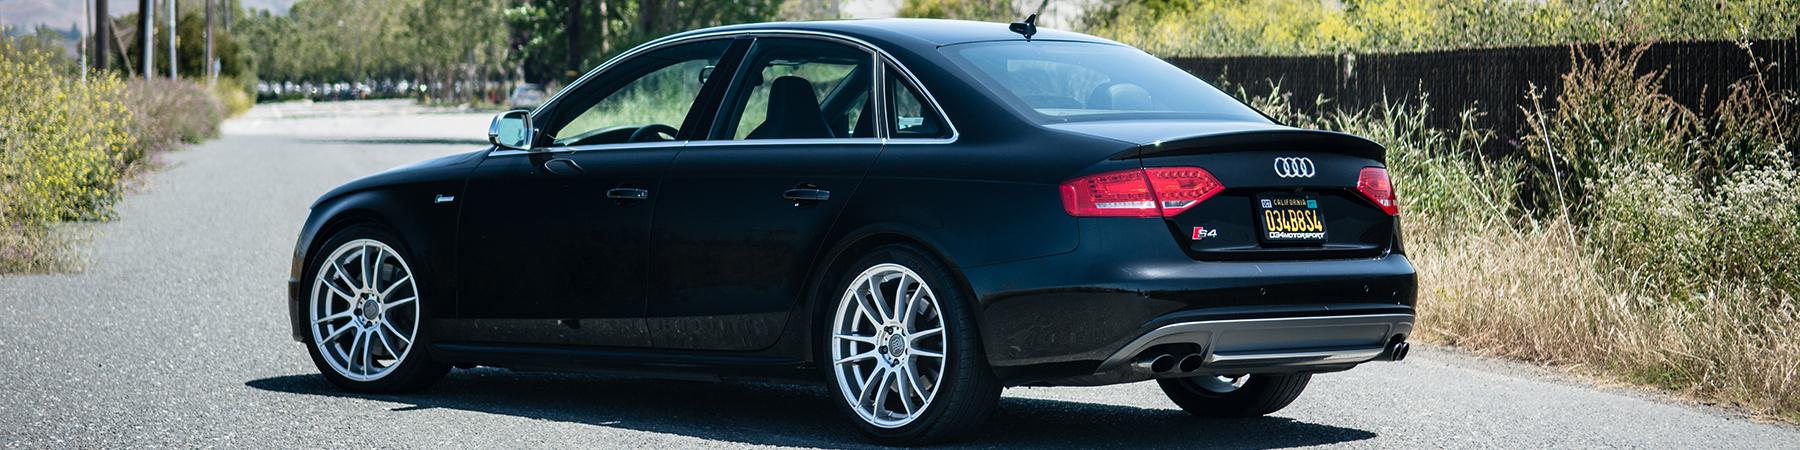 034Motorsport B8 Audi S4 Performance Development Vehicle